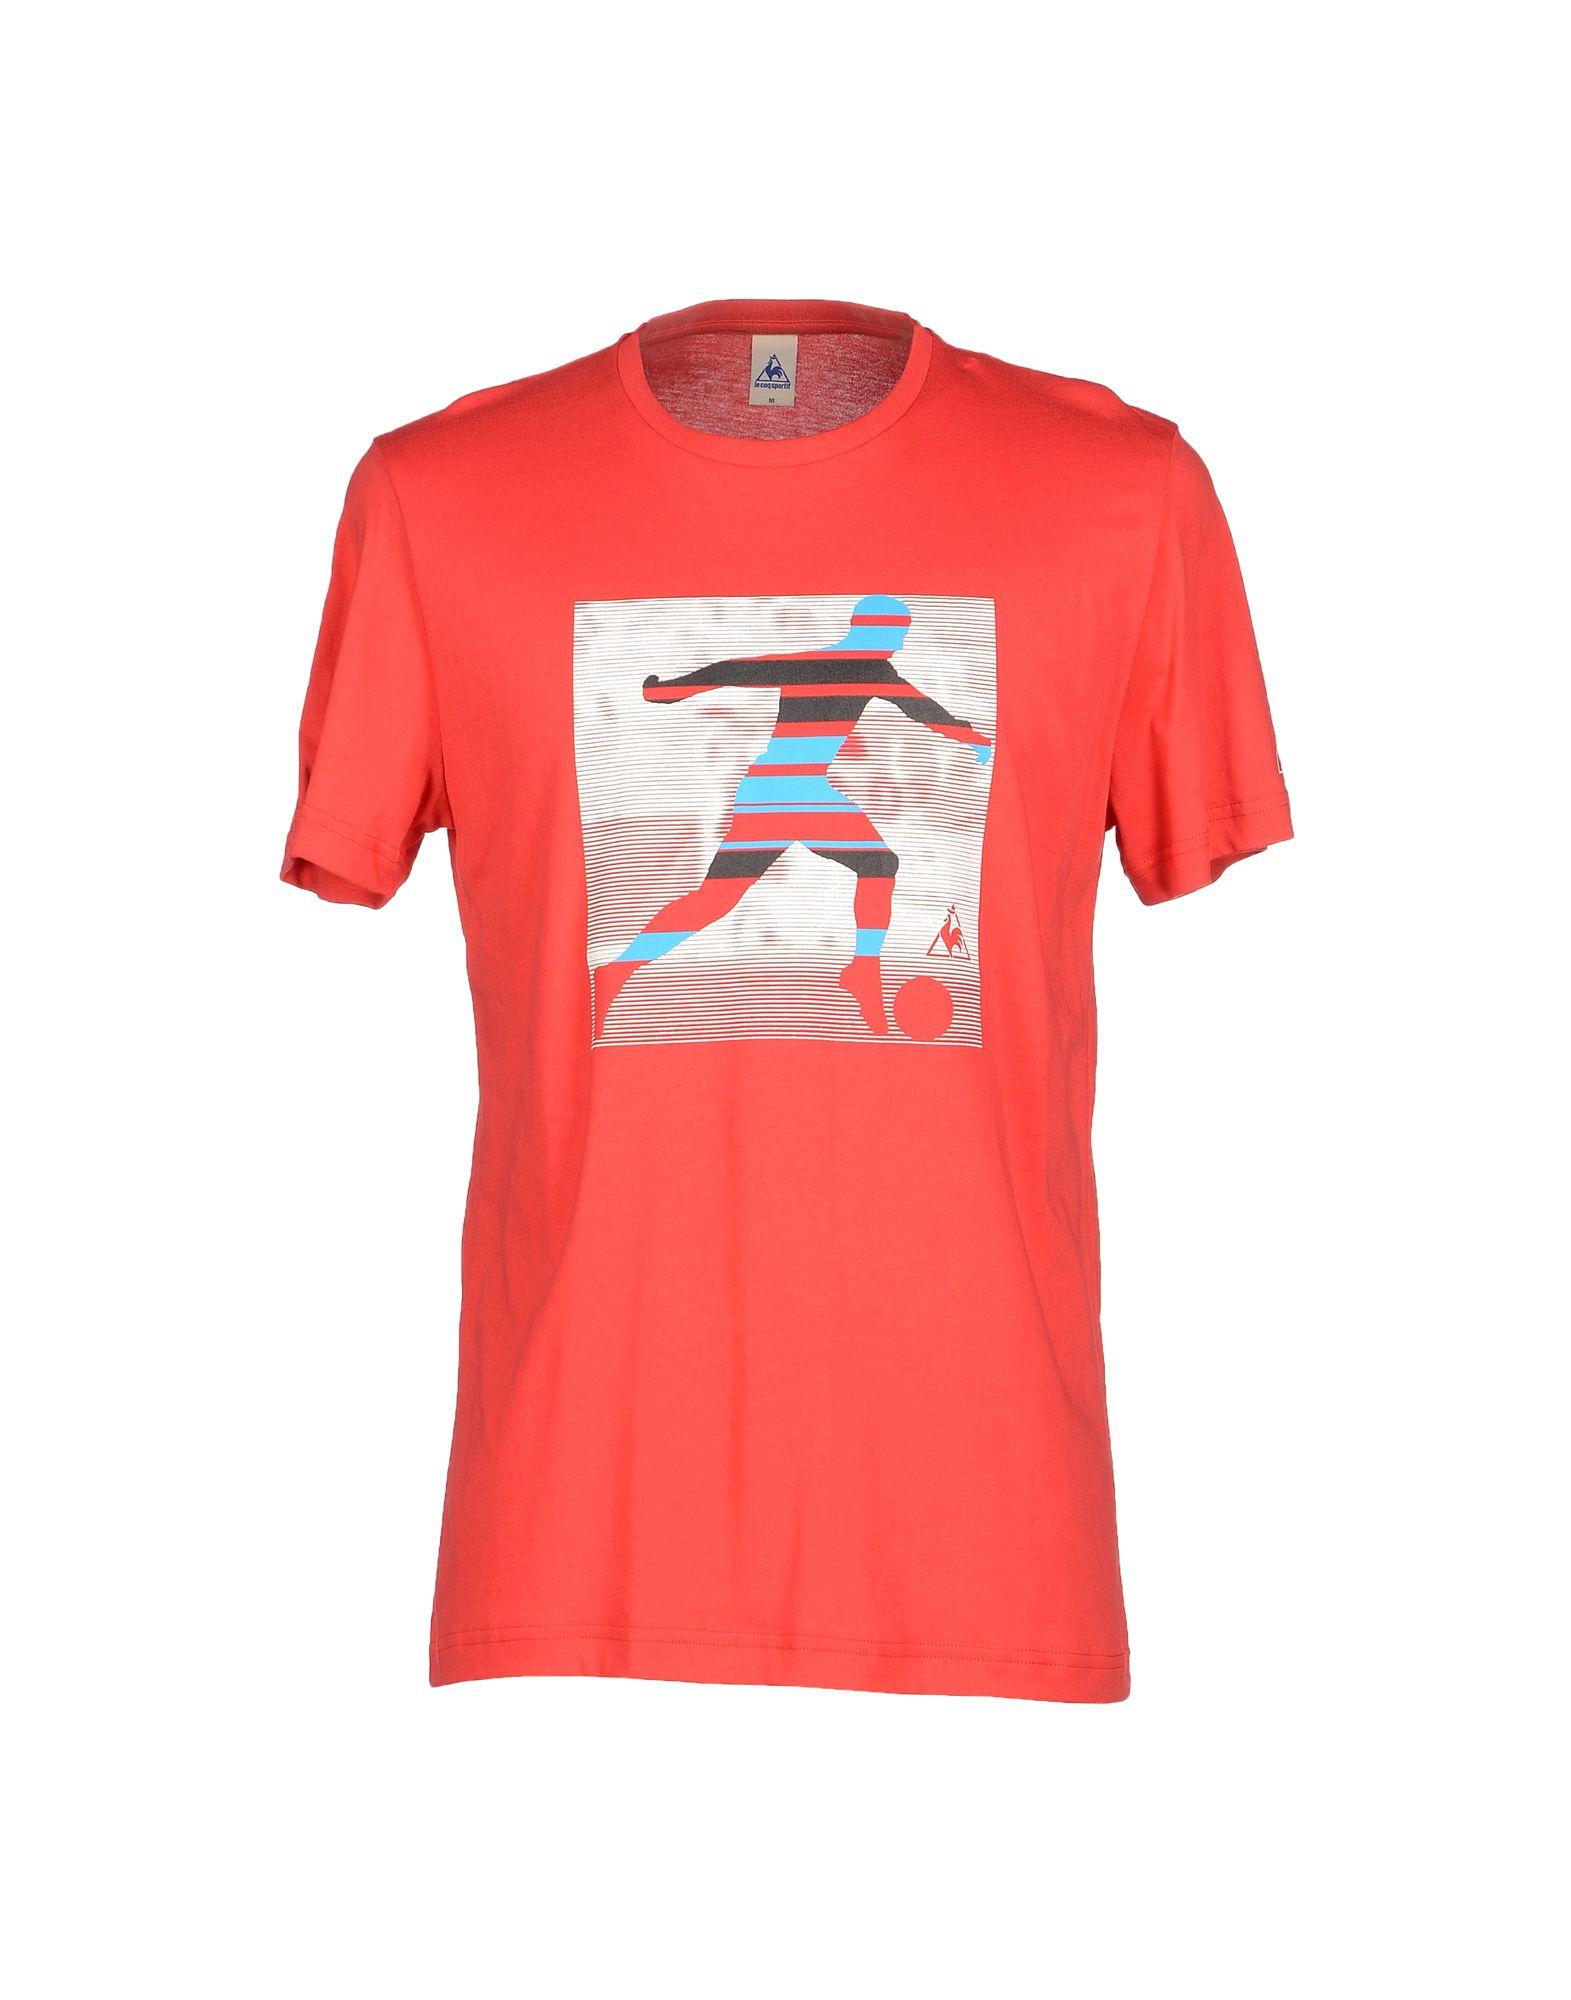 le coq sportif shirt - photo #22